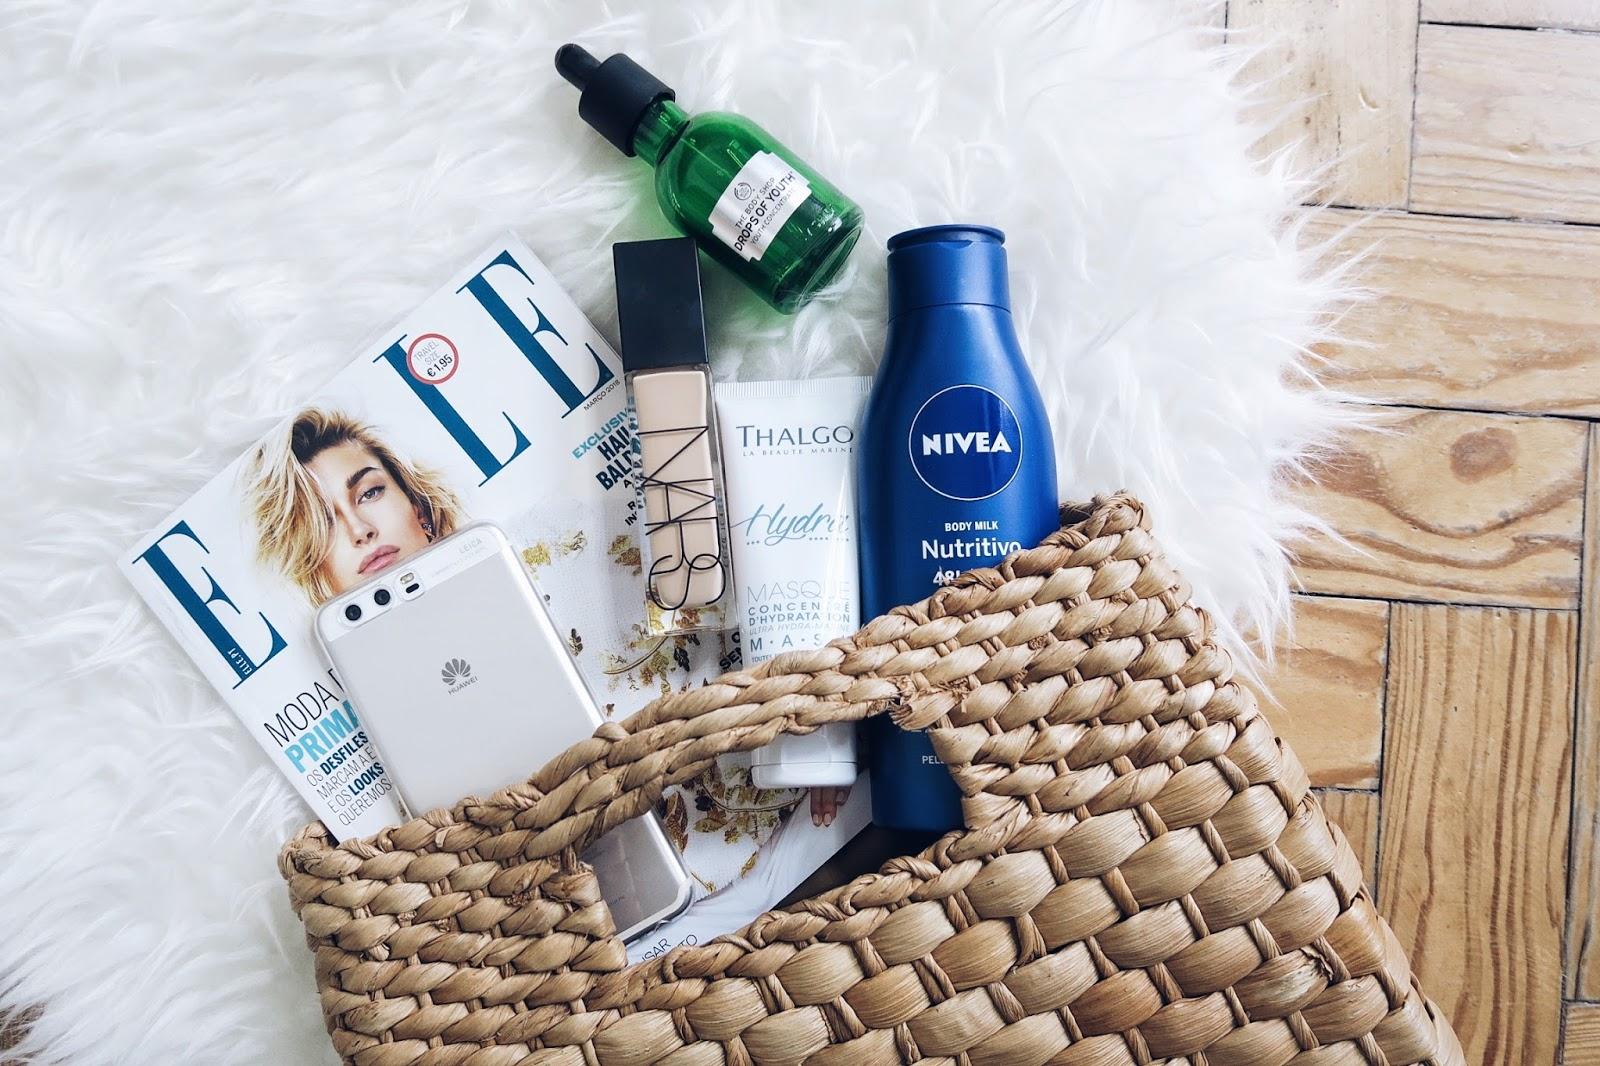 preferidos, best of, melhores produtos, beleza, beauty, blogger, just lily, sephora, nars, elle, the body shop, thalgo, huawei, nivea